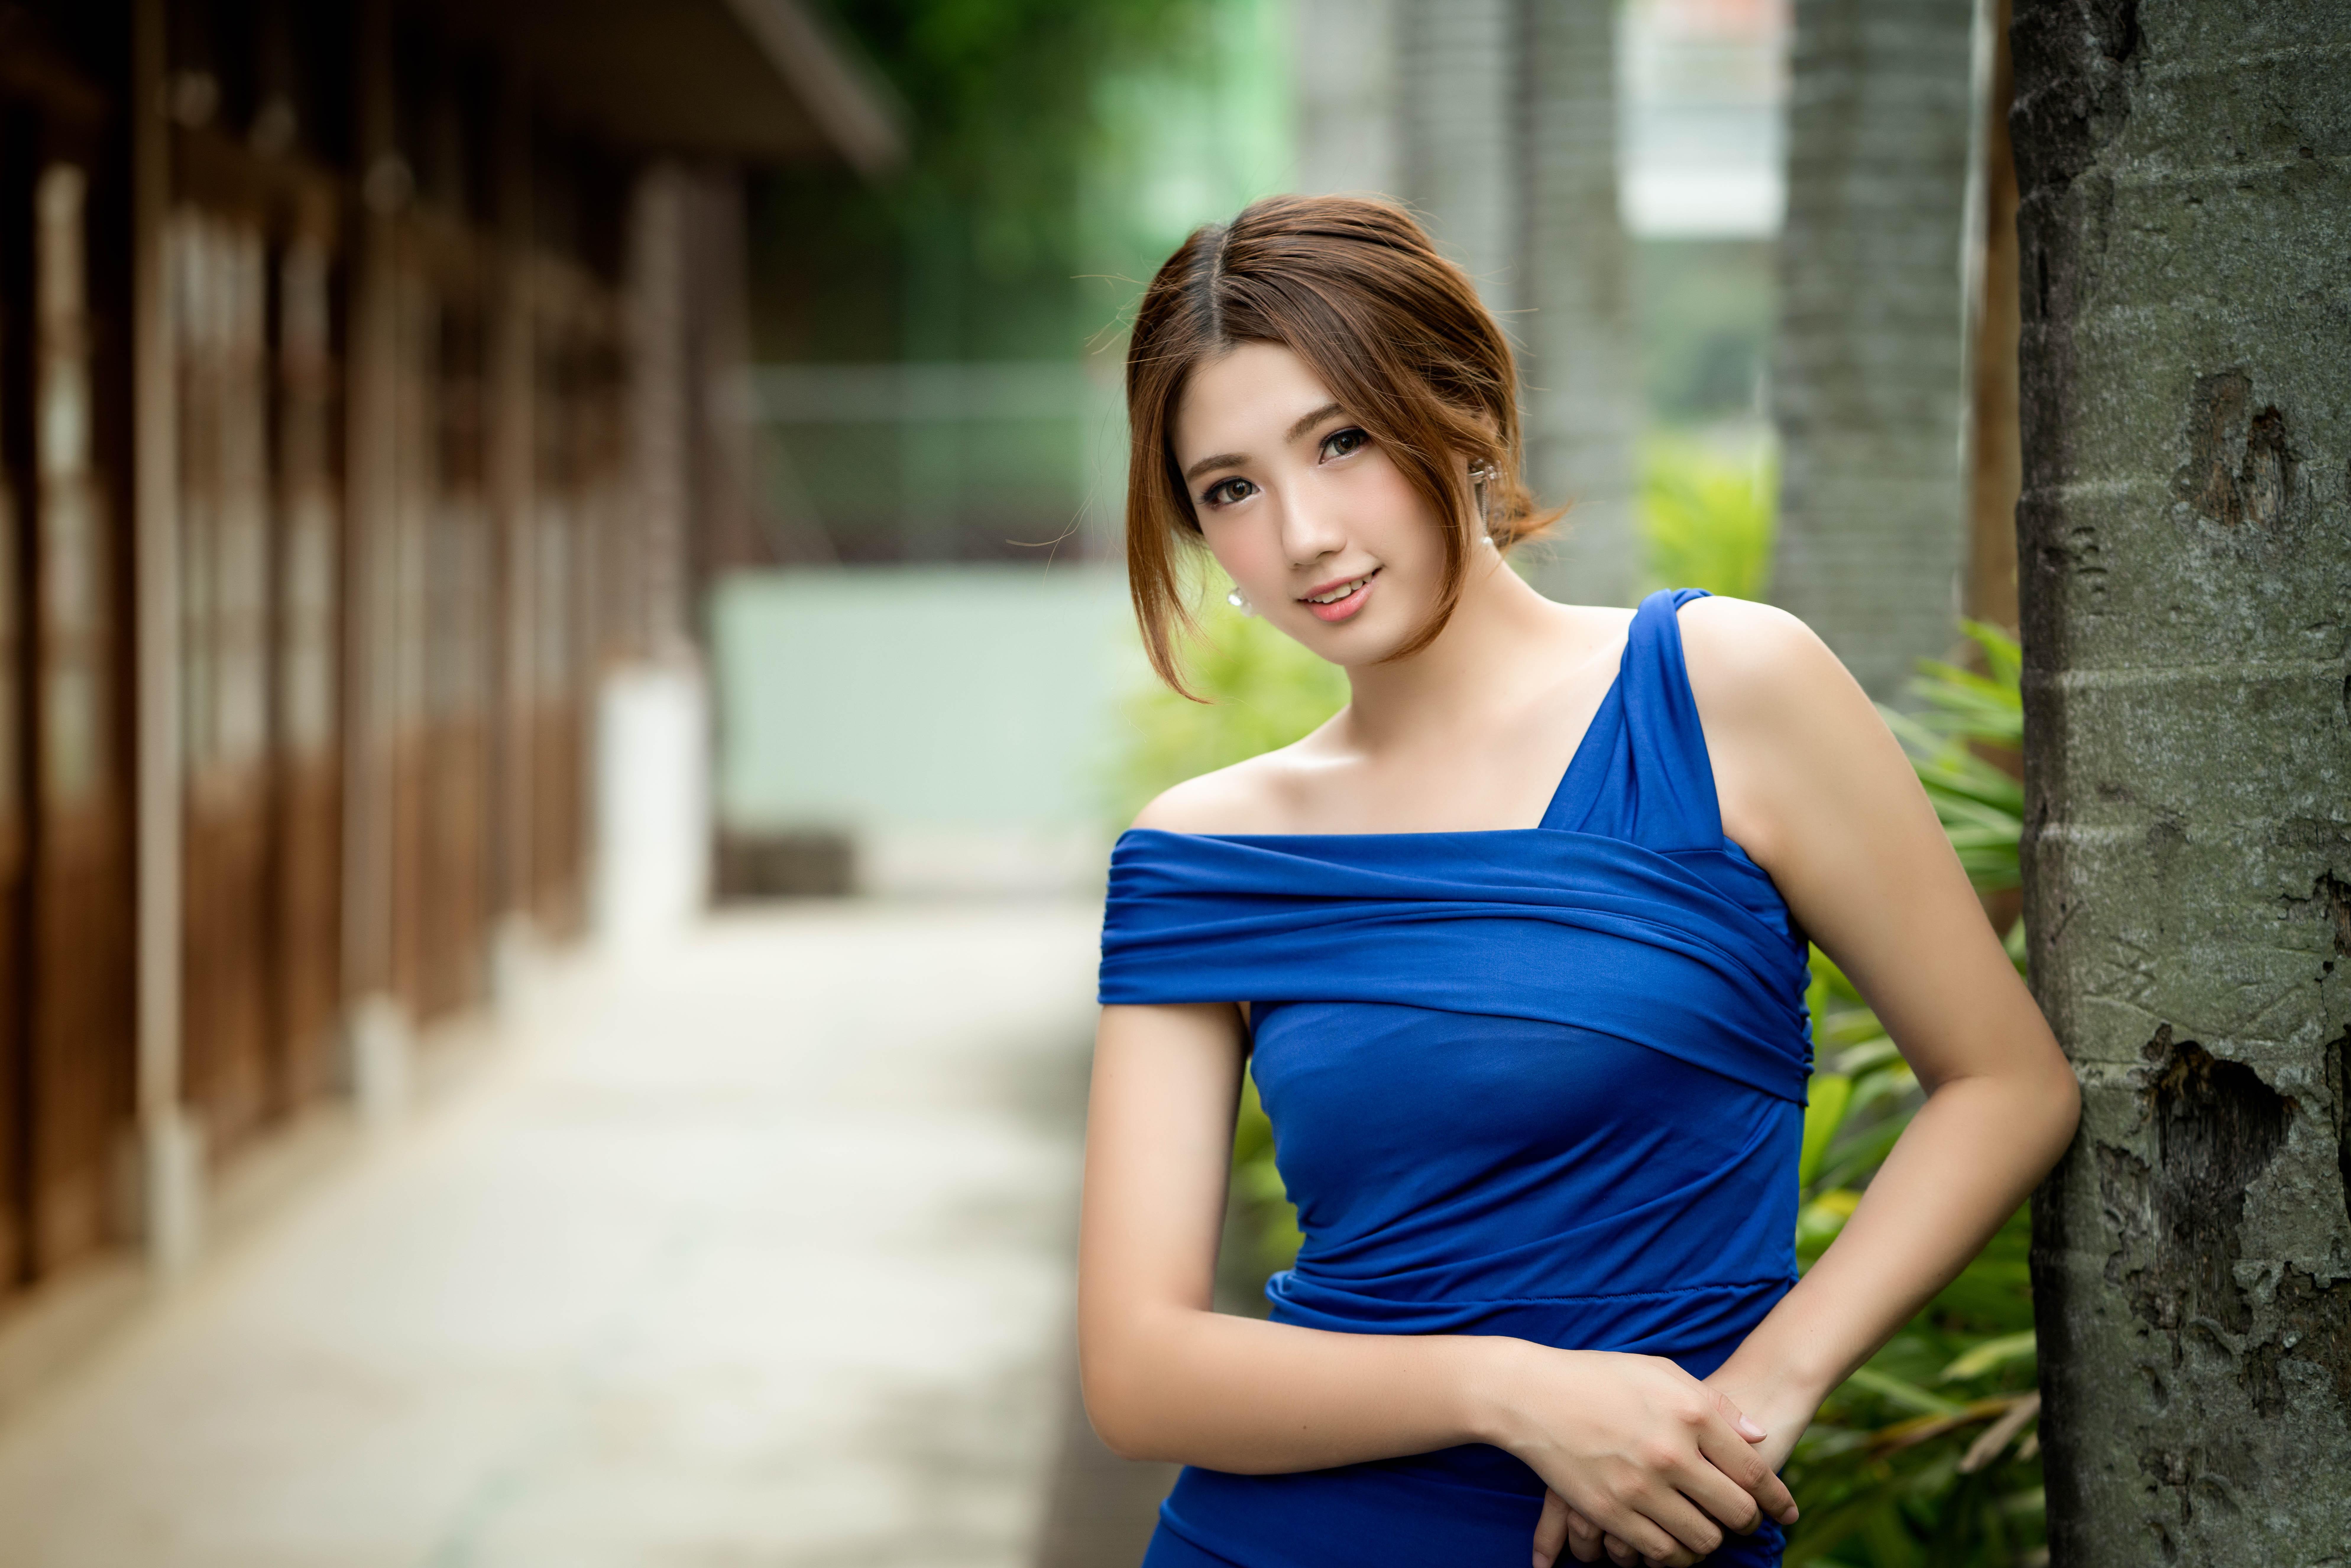 Xexi girl image